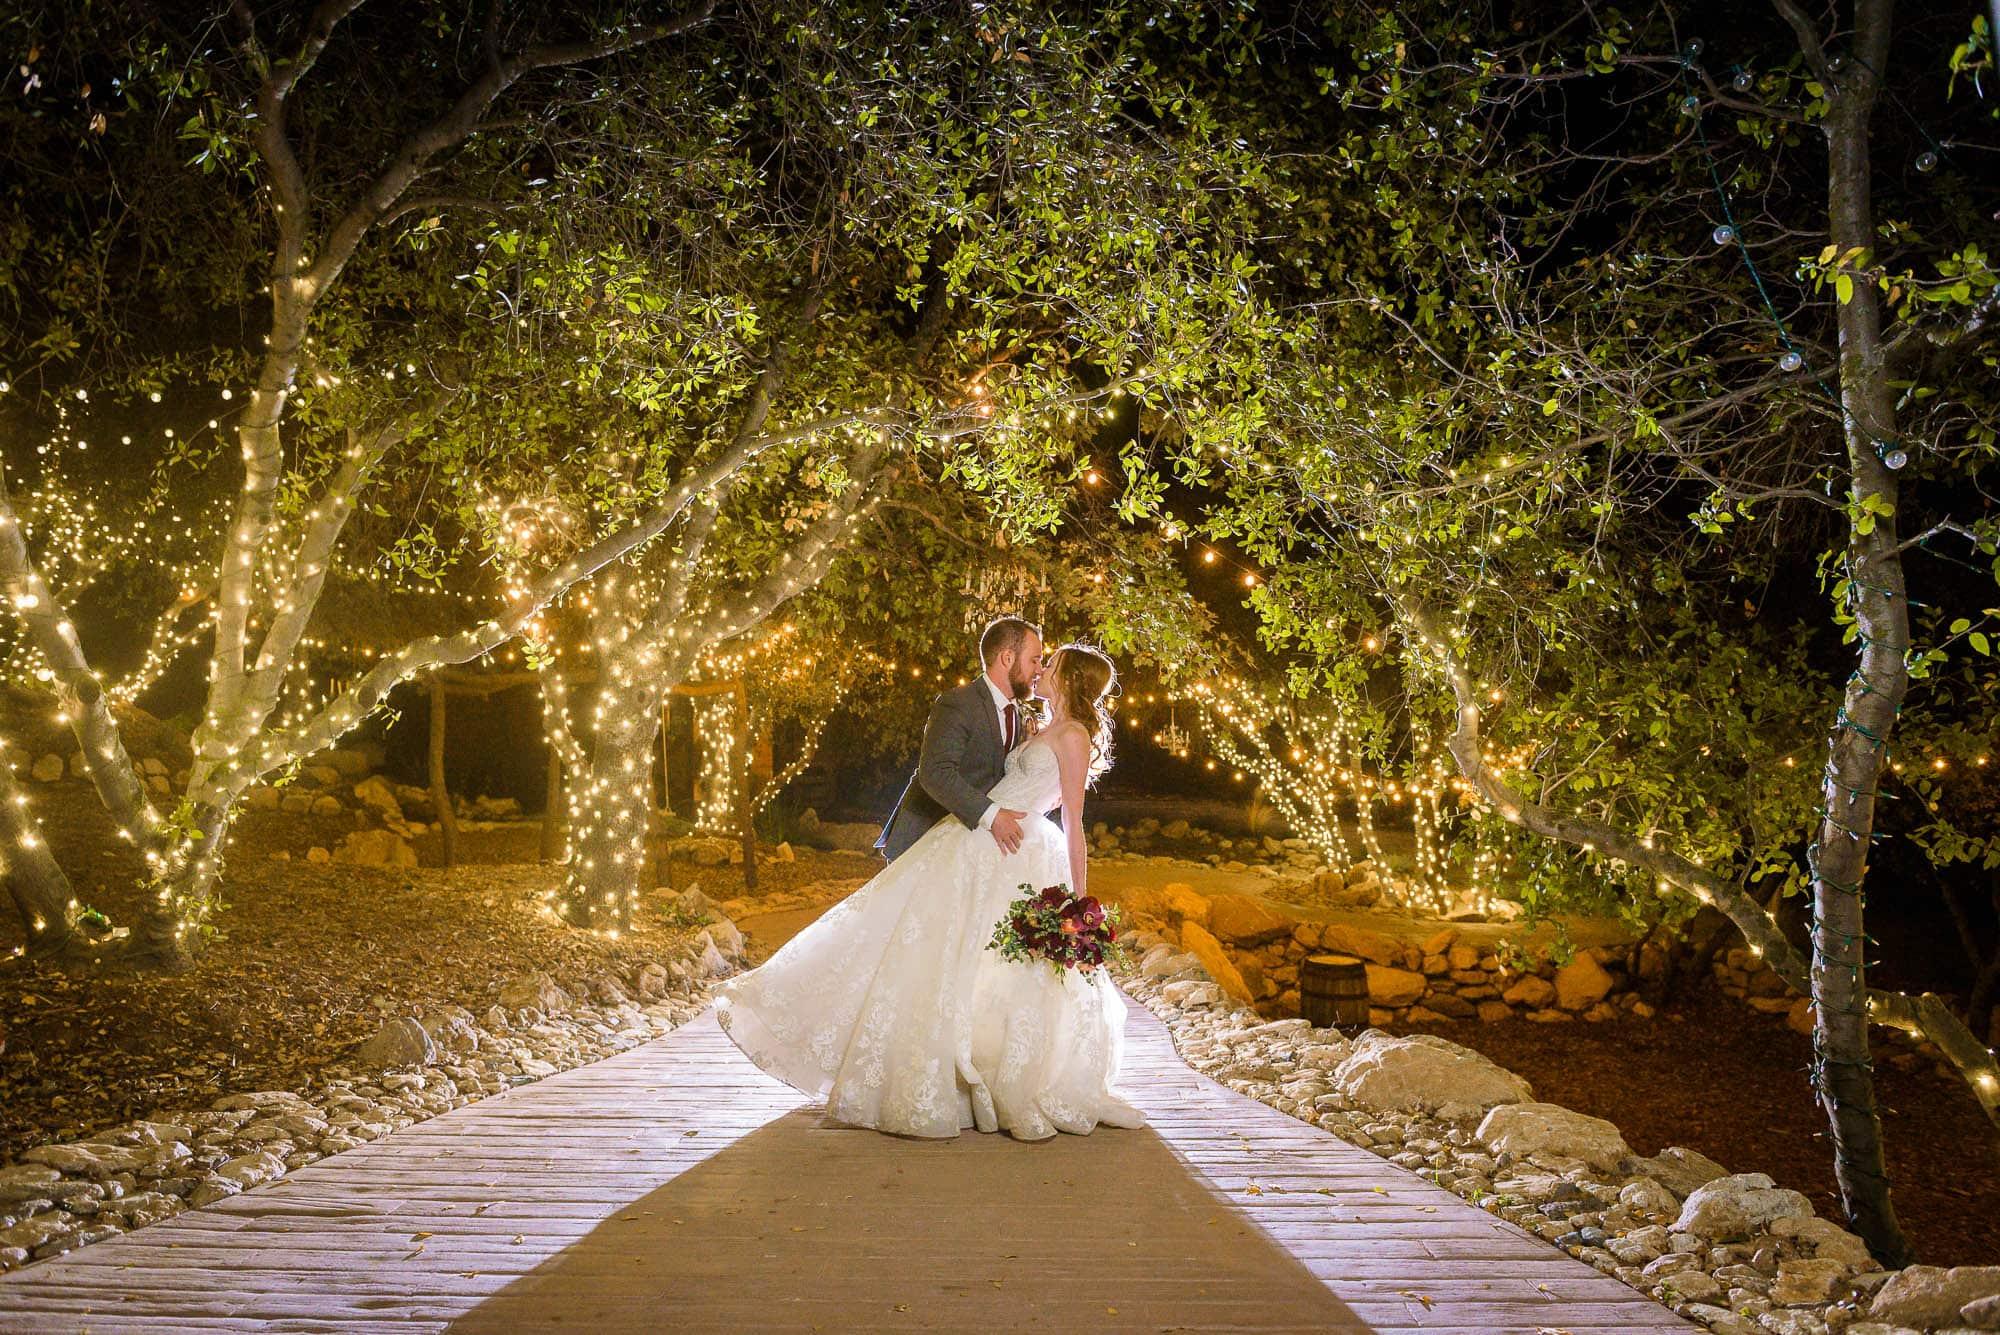 722_Alan_and_Heidi_Serendipity_Garden_Wedding_10-27-2018